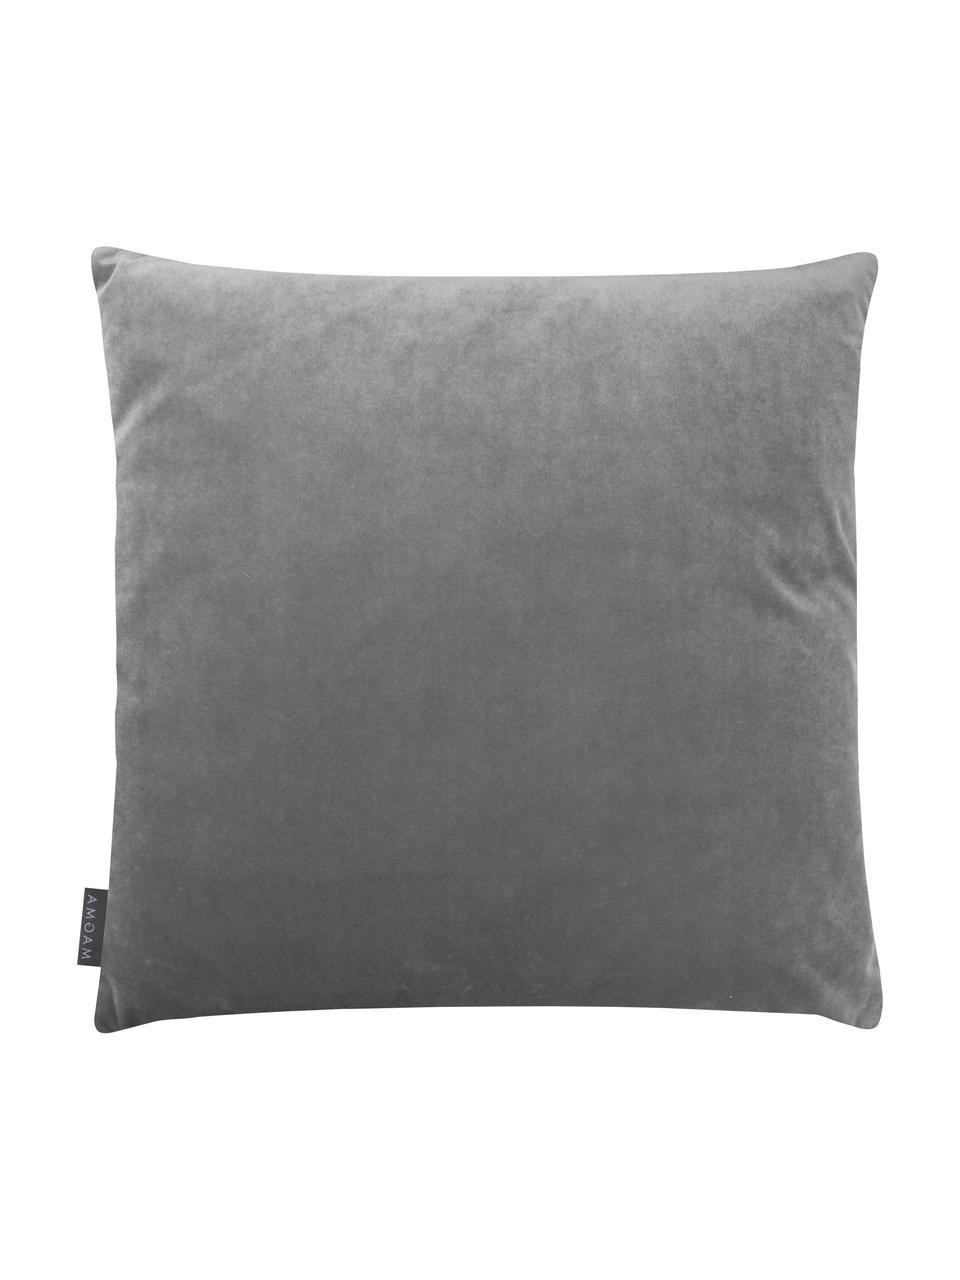 Samt-Kissenhülle Nobless in Grau mit erhabenem Rautenmuster, 100% Polyestersamt, Grau, 40 x 40 cm